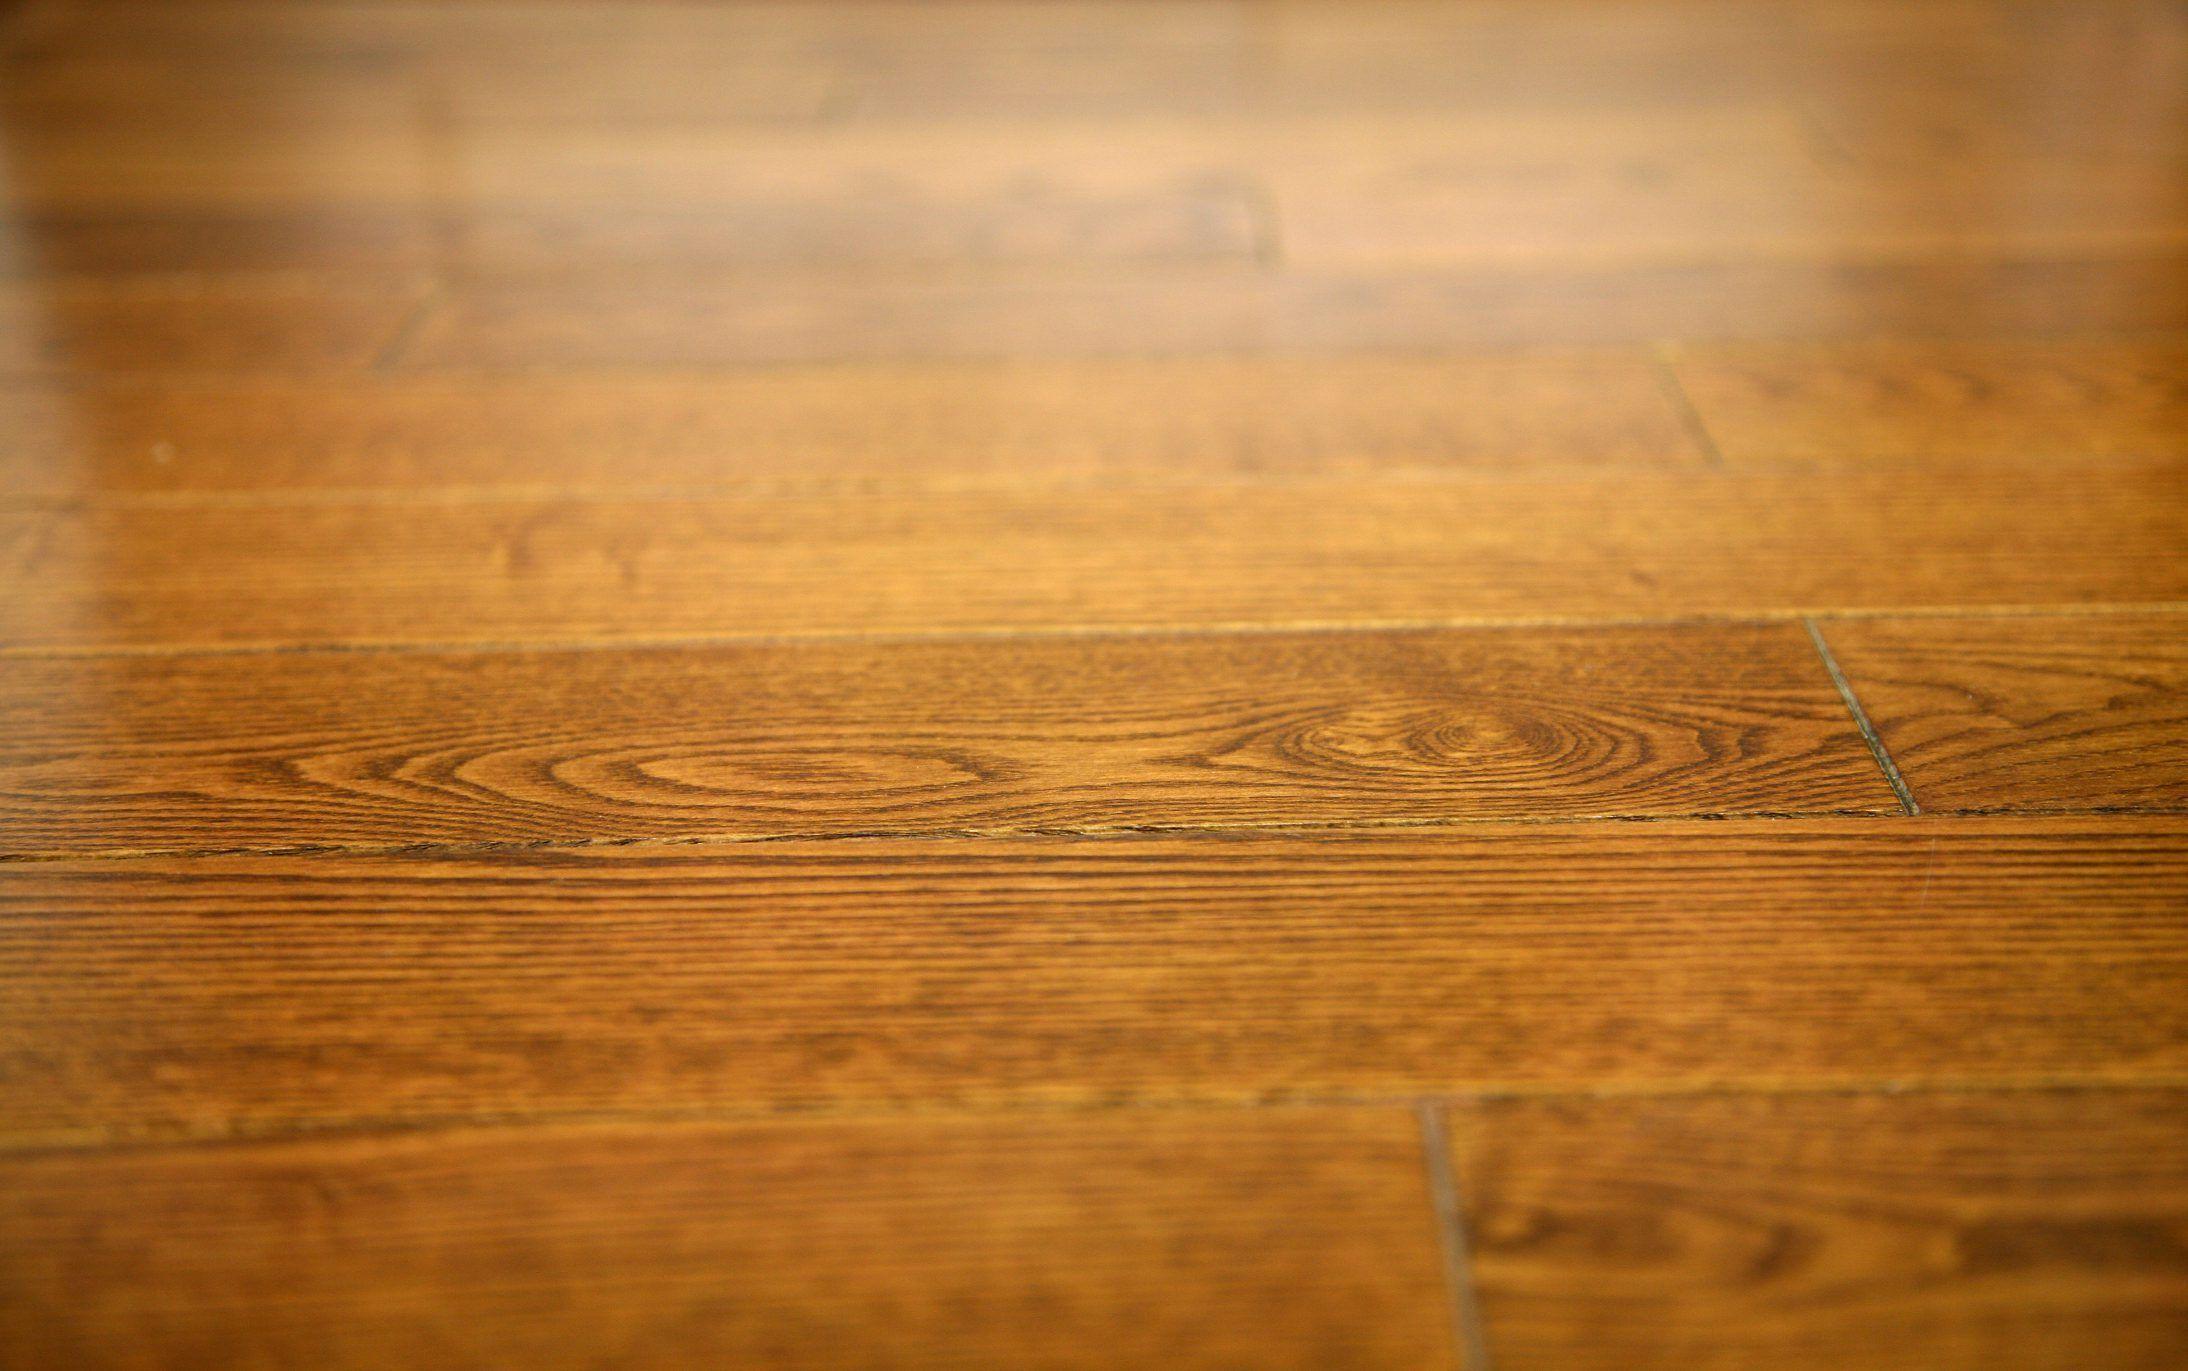 How To Keep Wood Floors Shiny Using Home Remedies Cleaning Wood Floors Hardwood Floors Clean Hardwood Floors